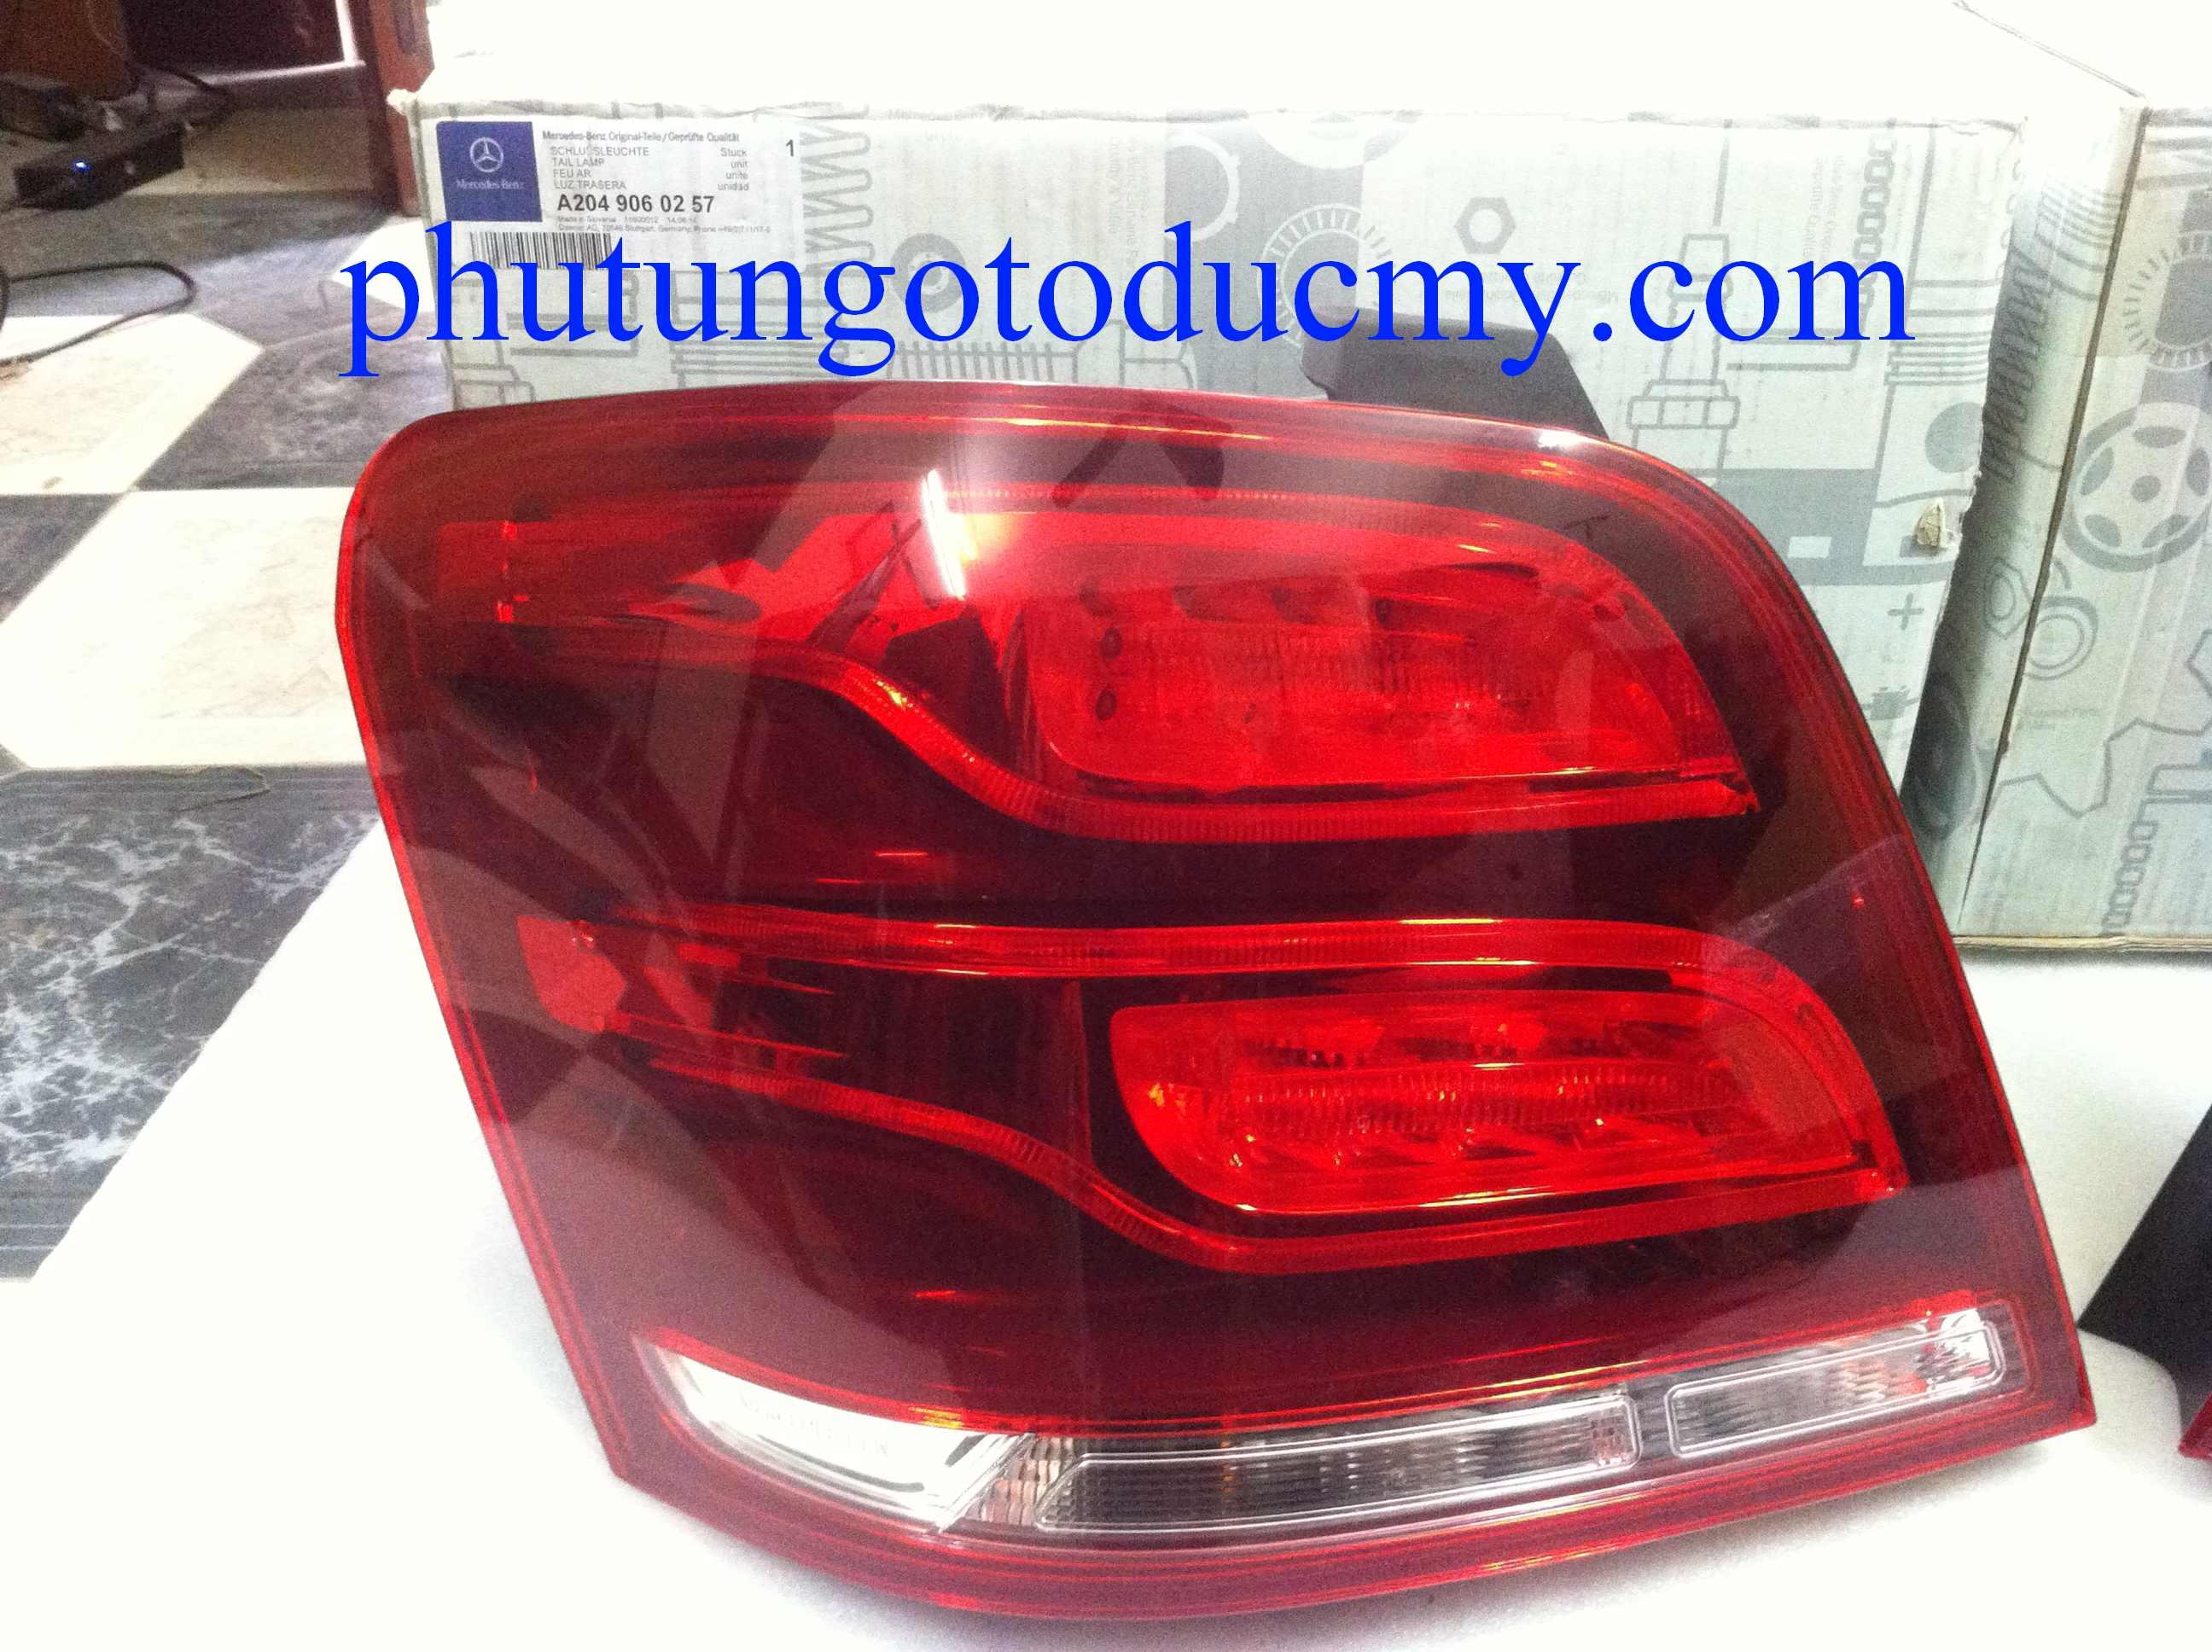 Đèn hậu Mercedes GLK250,GLK220- A2049060257